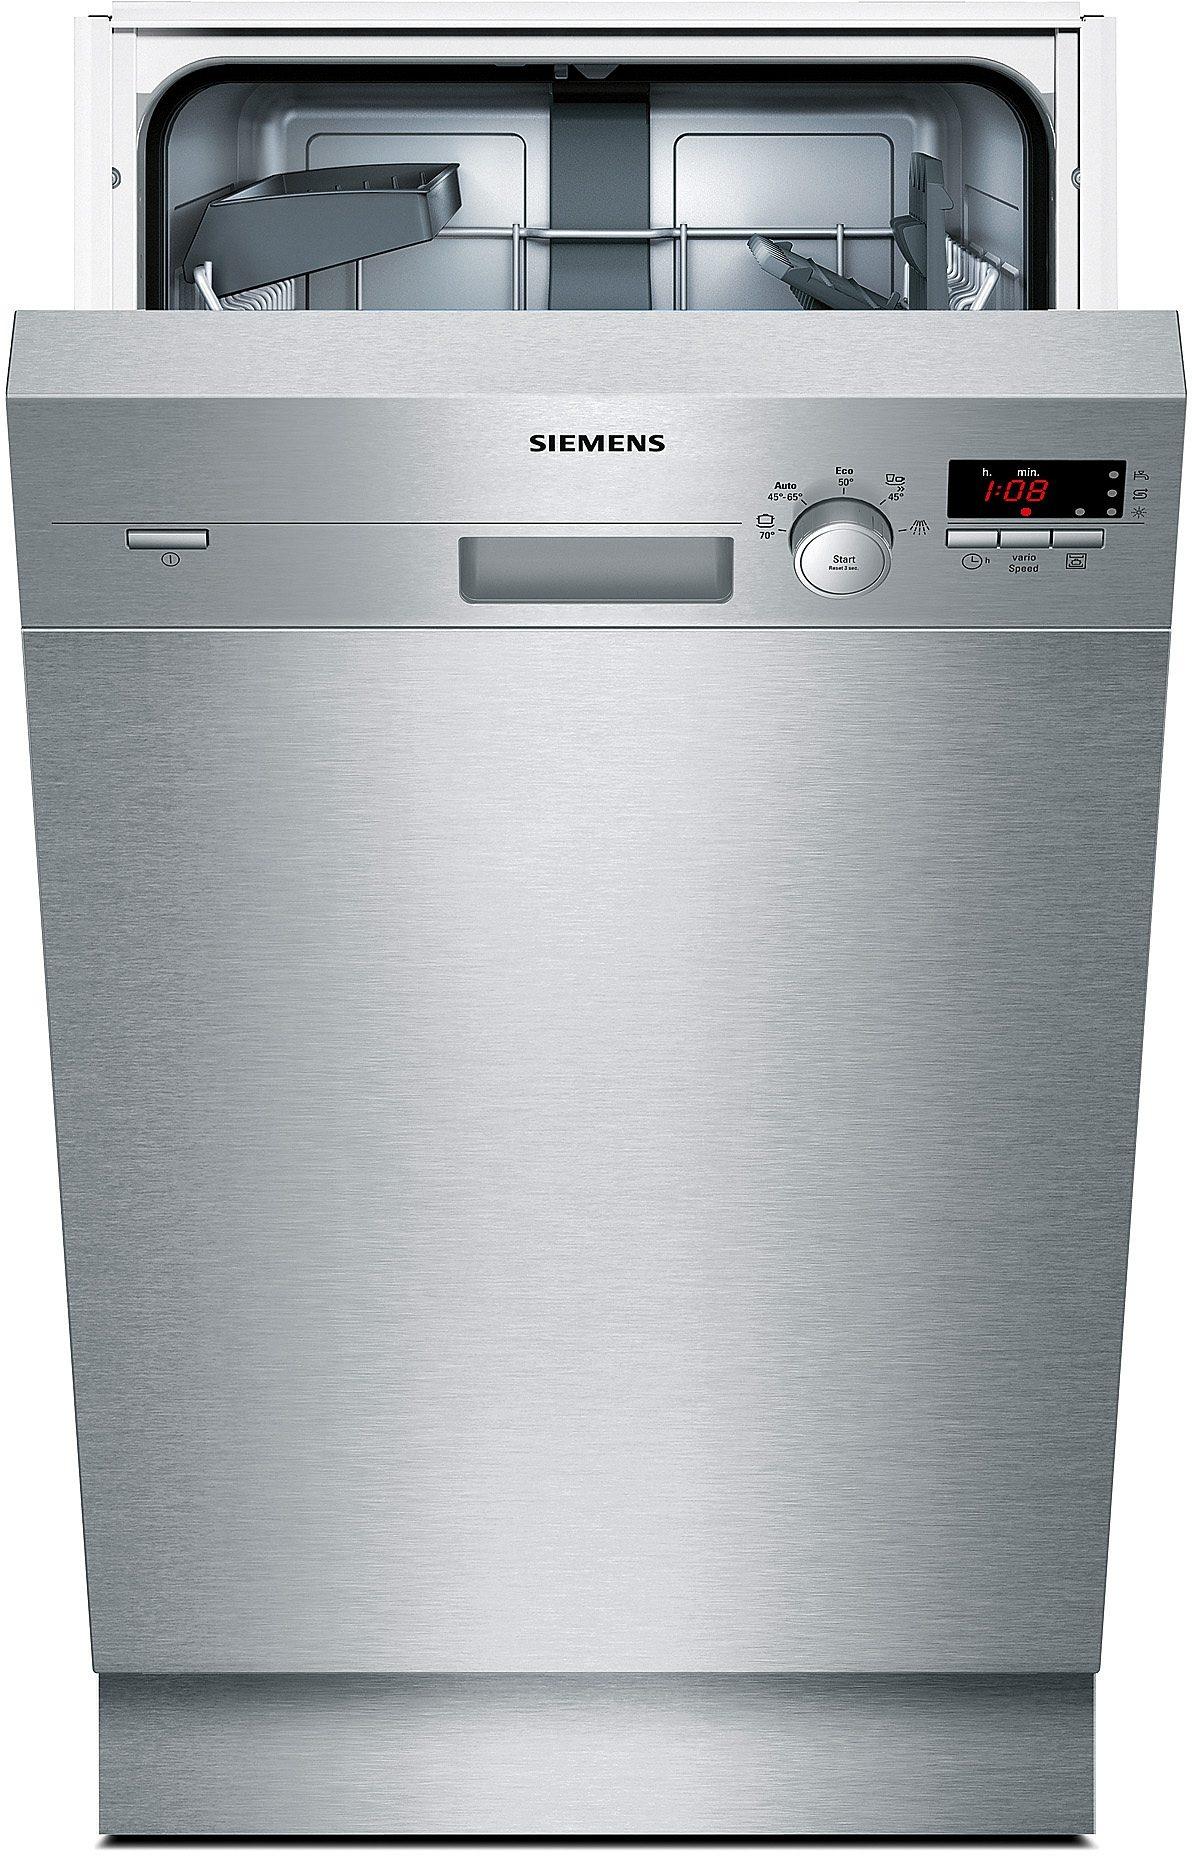 Siemens Unterbau-Geschirrspüler SR45E507EU, Energieklasse A+, 9,5 Liter, 9Maßgedecke